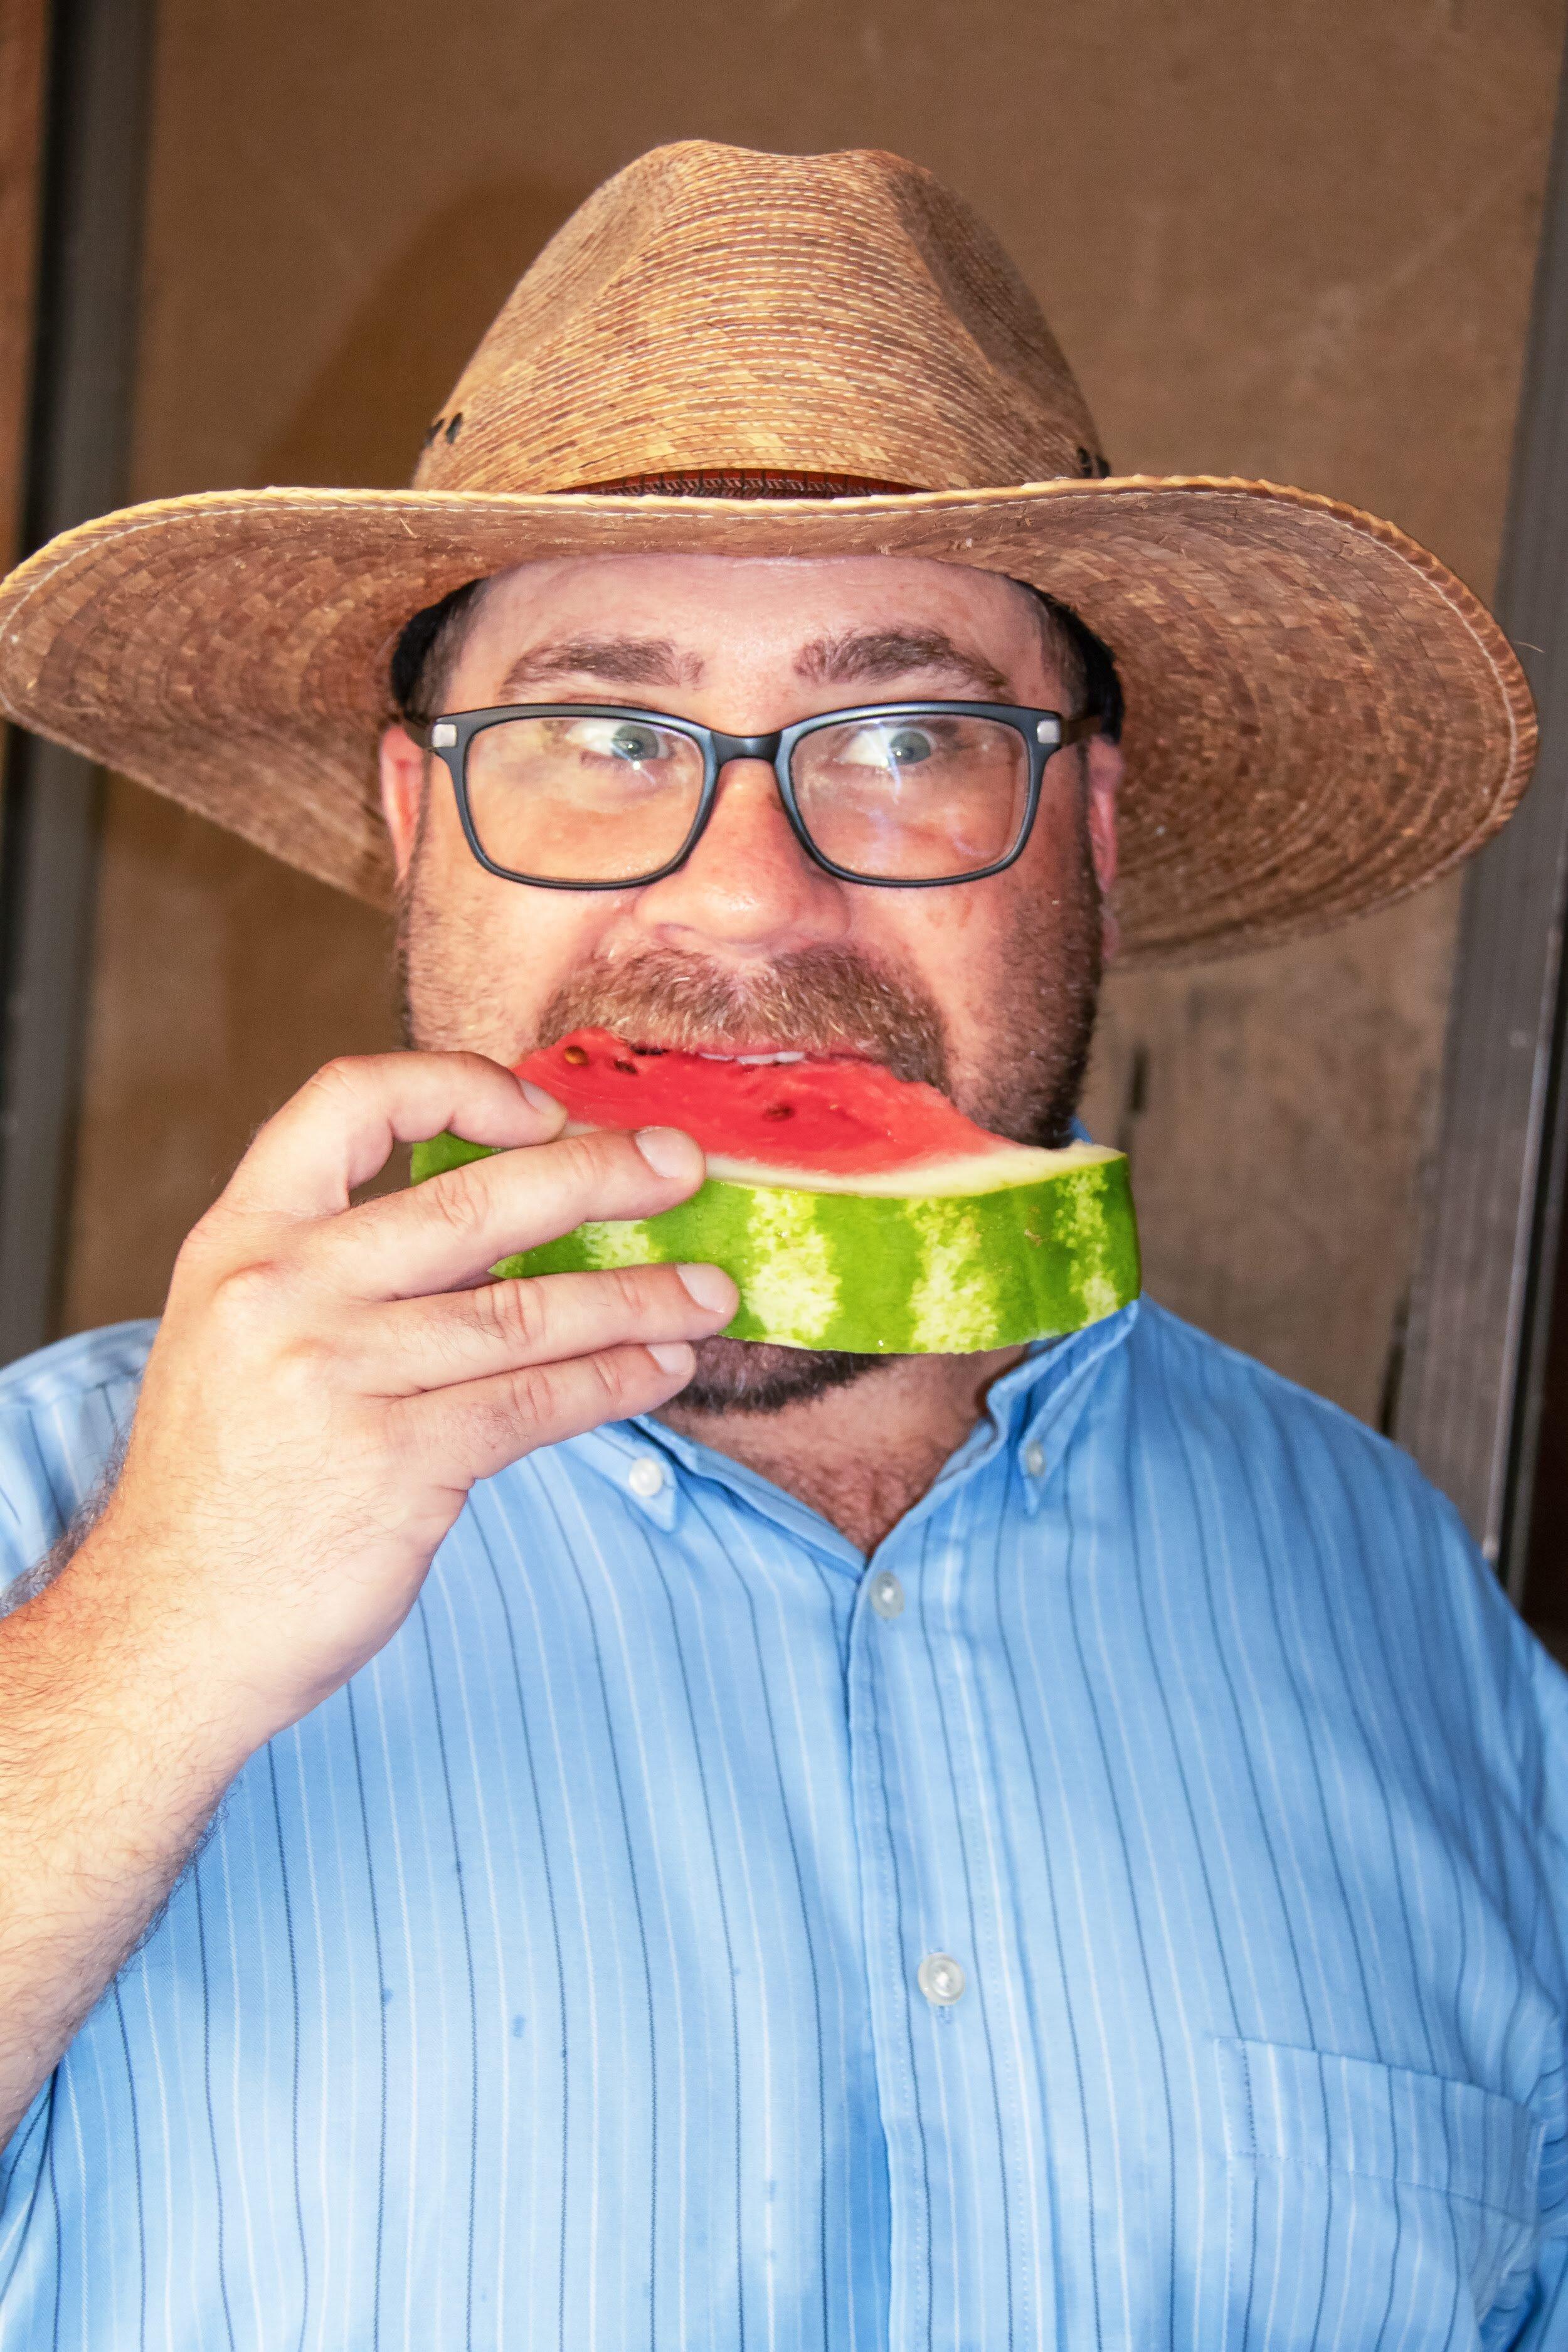 Man eating watermelon.jpg